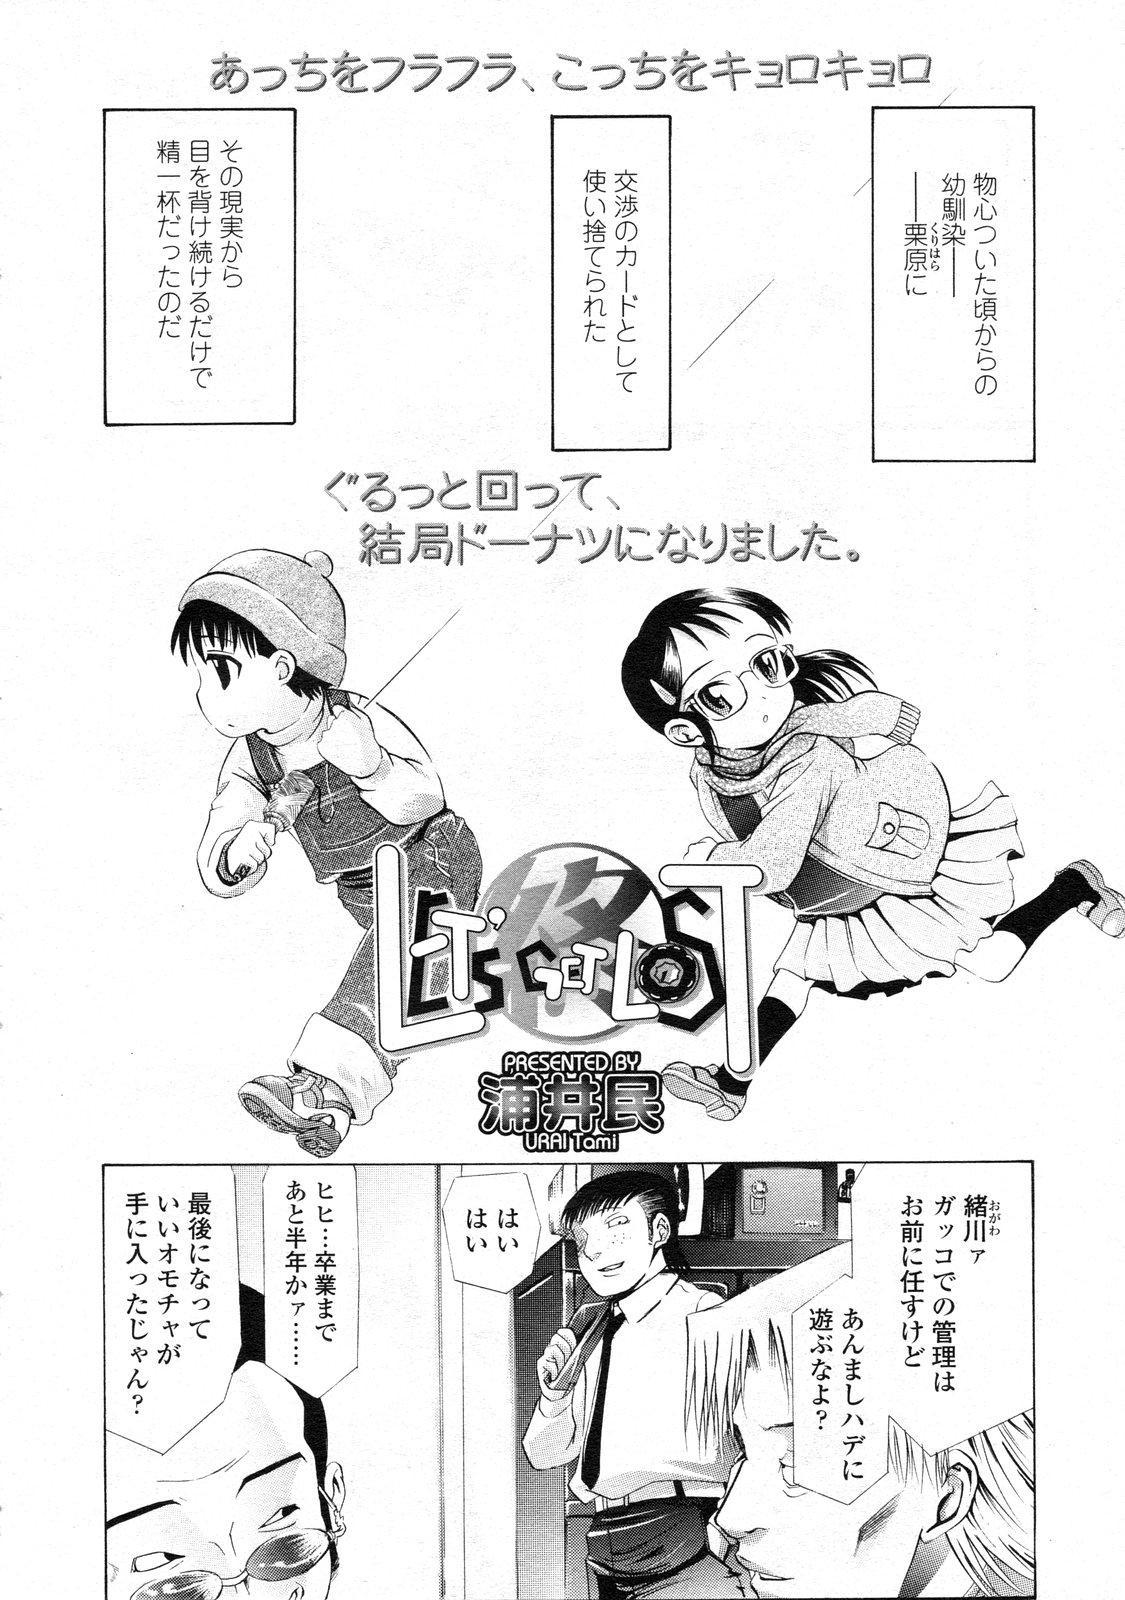 COMIC LO 2009-09 Vol. 66 324